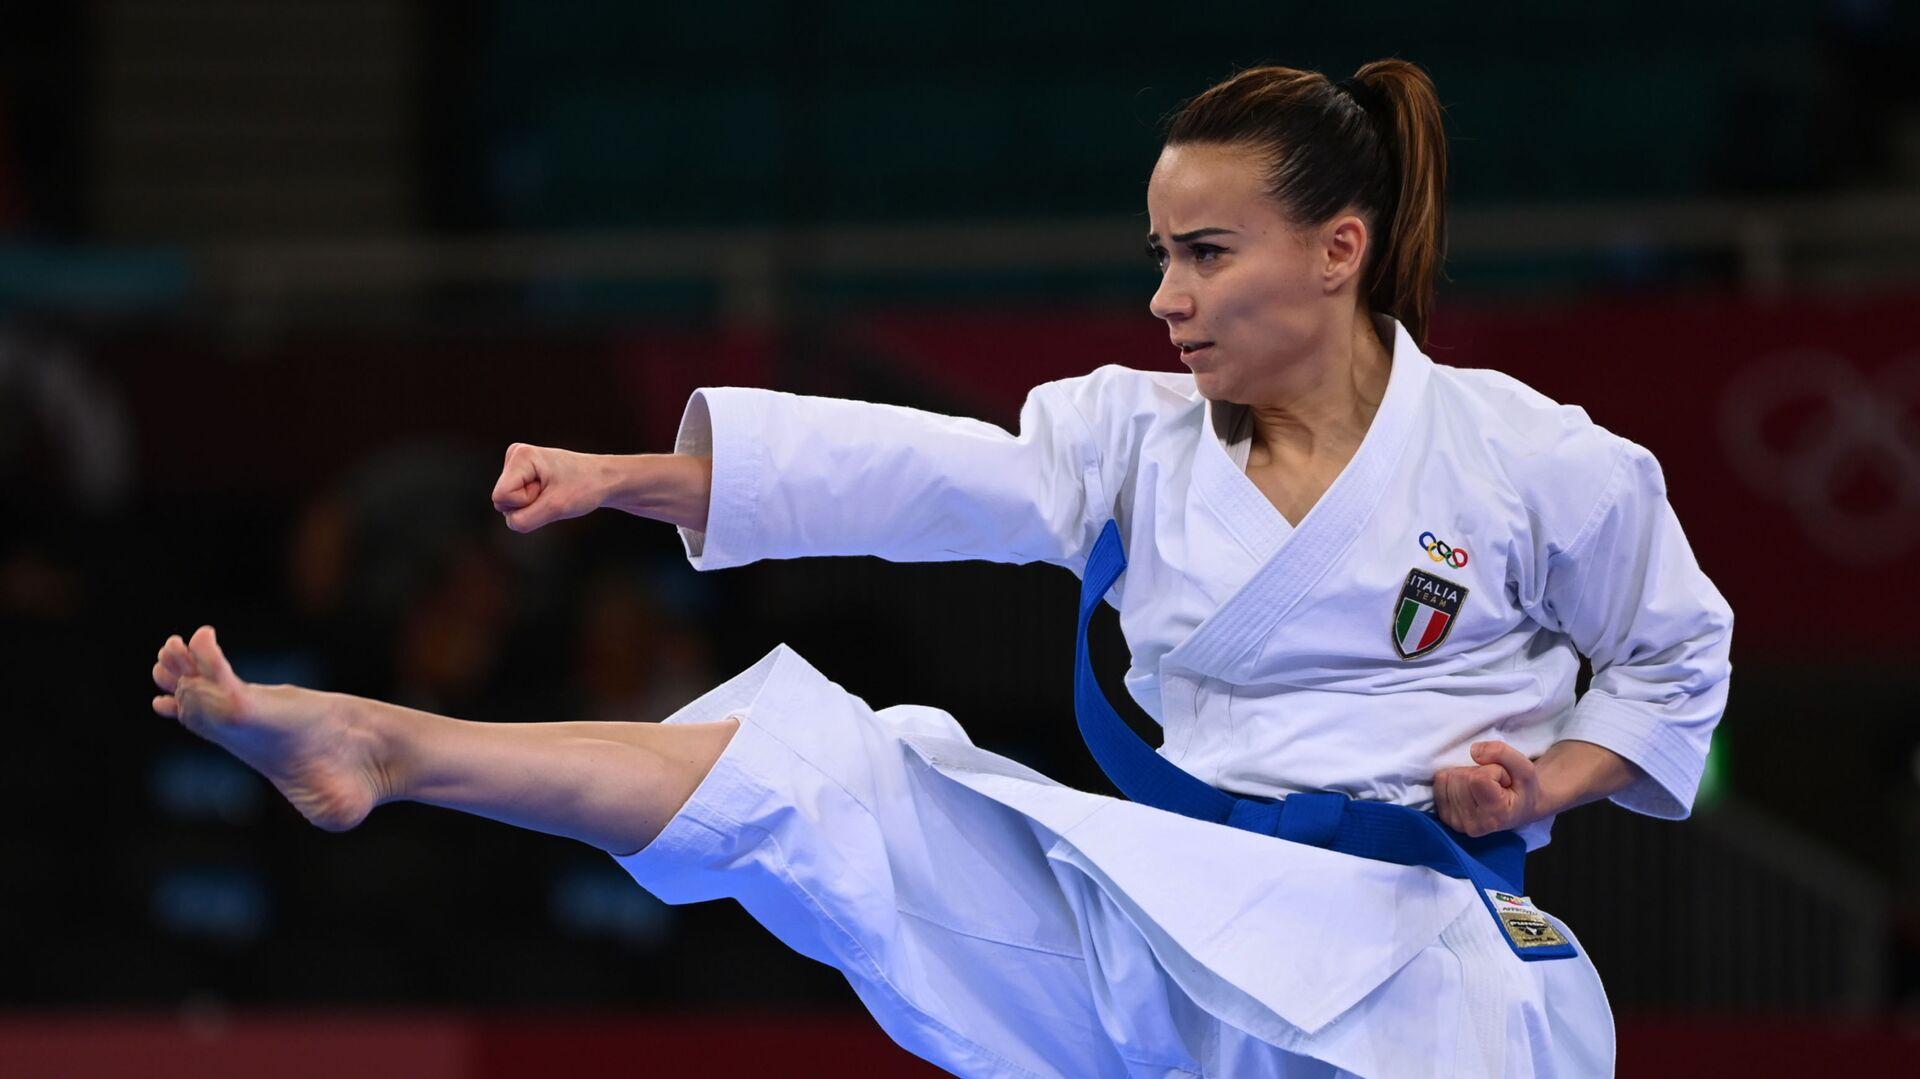 Viviana Bottaro, karateka italiana - Sputnik Italia, 1920, 05.08.2021